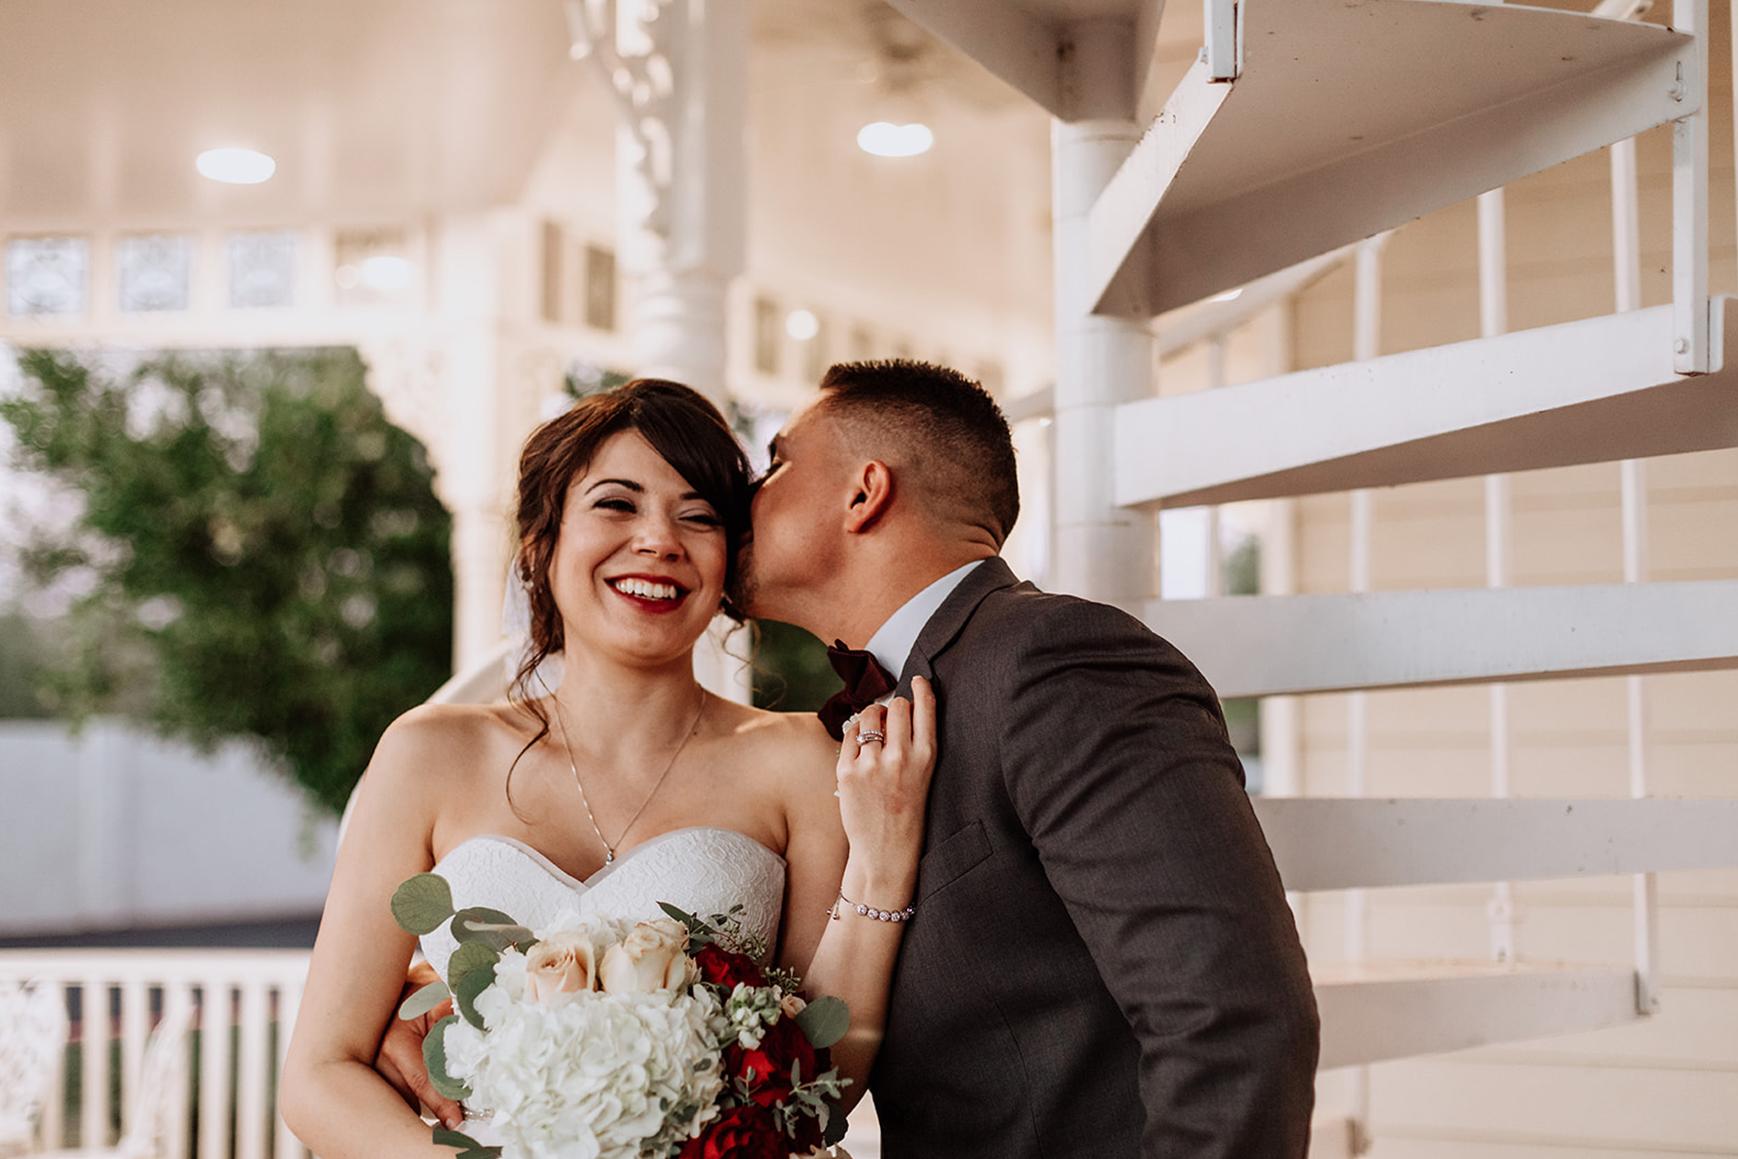 Groom kissing bride's cheek - Lindsay Grove - Mesa, Arizona - Maricopa County - Wedgewood Weddings